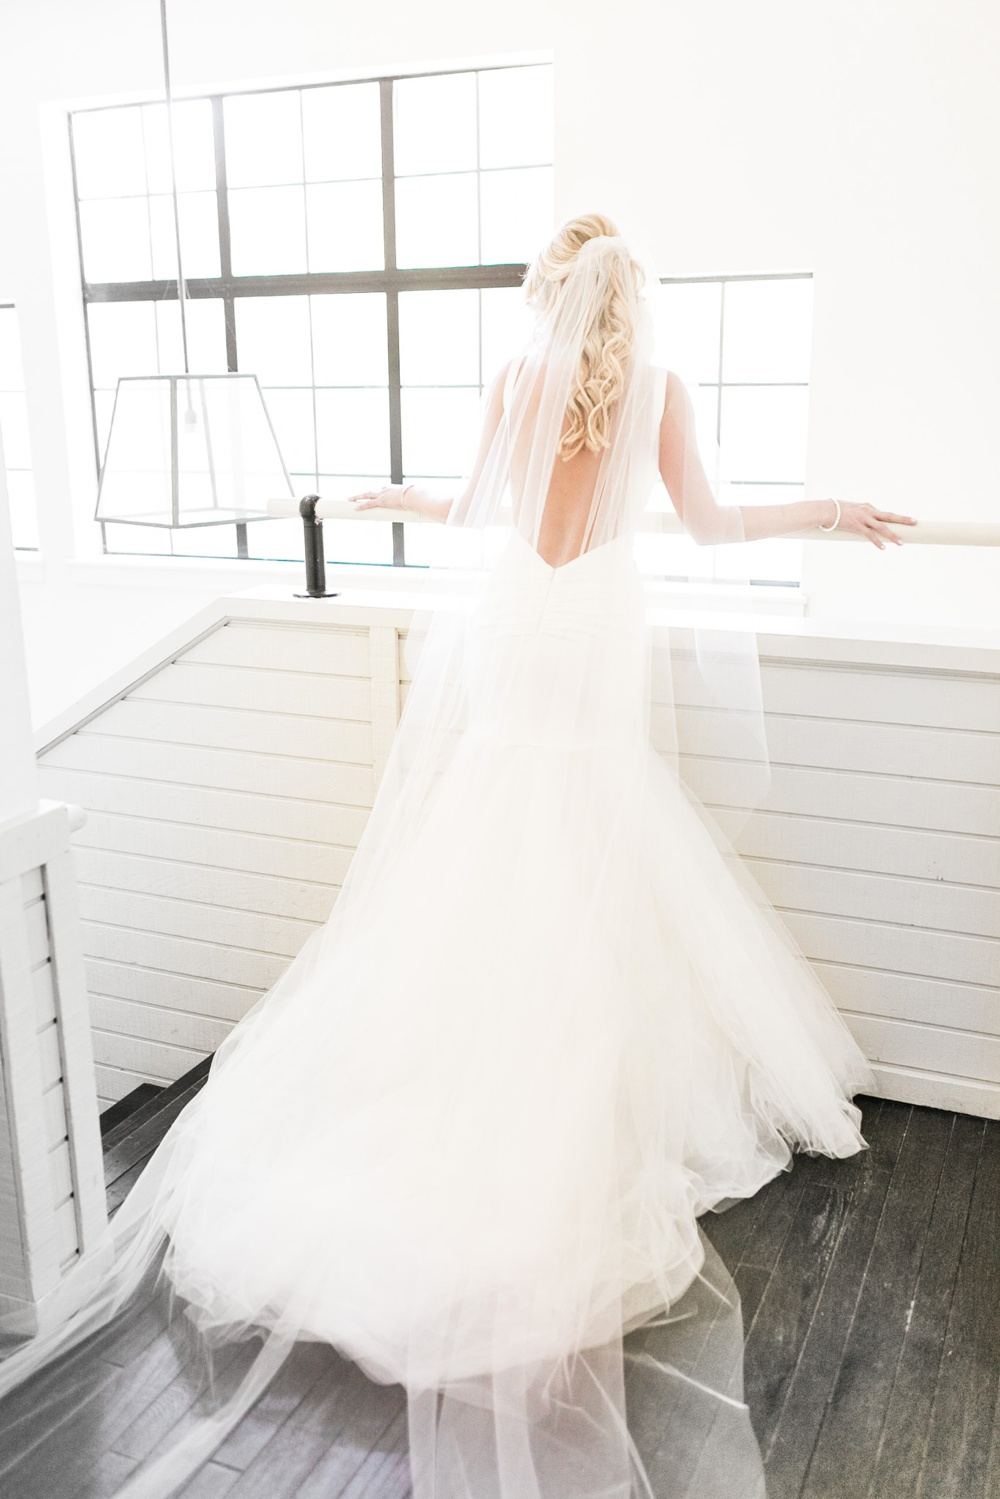 Hyatt-Lake-Tahoe-Wedding-Photographer-Regency-Mandy-Ford-Photography_0009.jpg